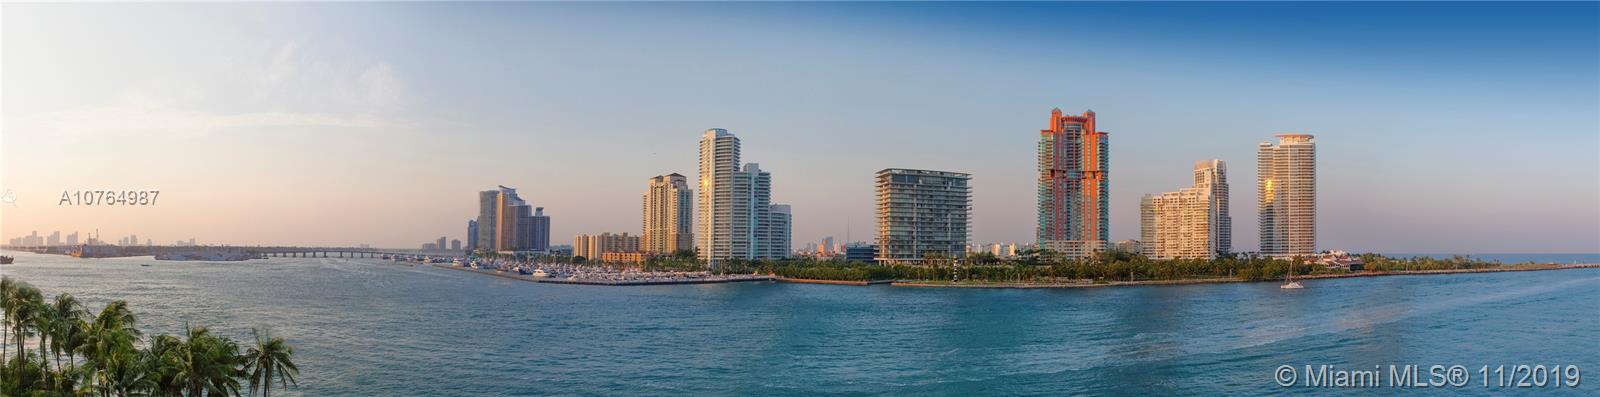 6823 Fisher Island Dr 6823, Miami Beach, FL 33109